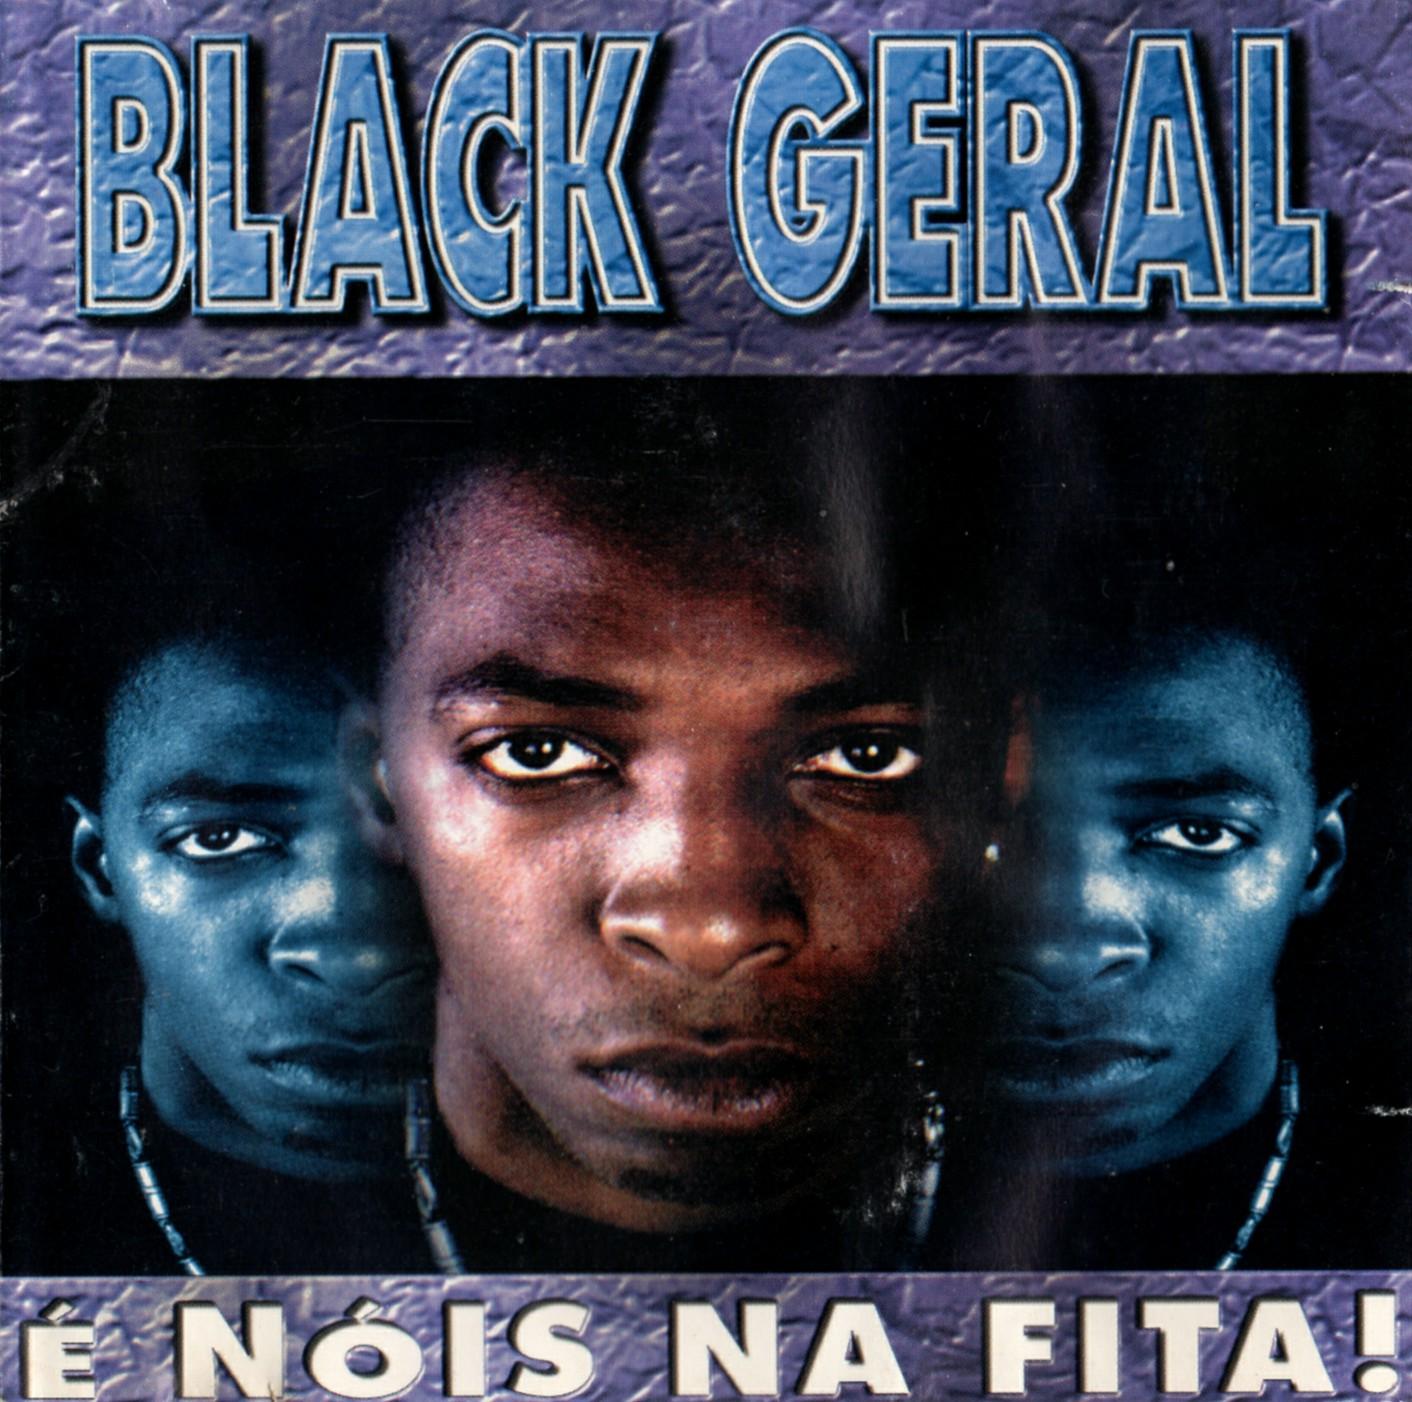 Black Geral E Nois Na Fita !